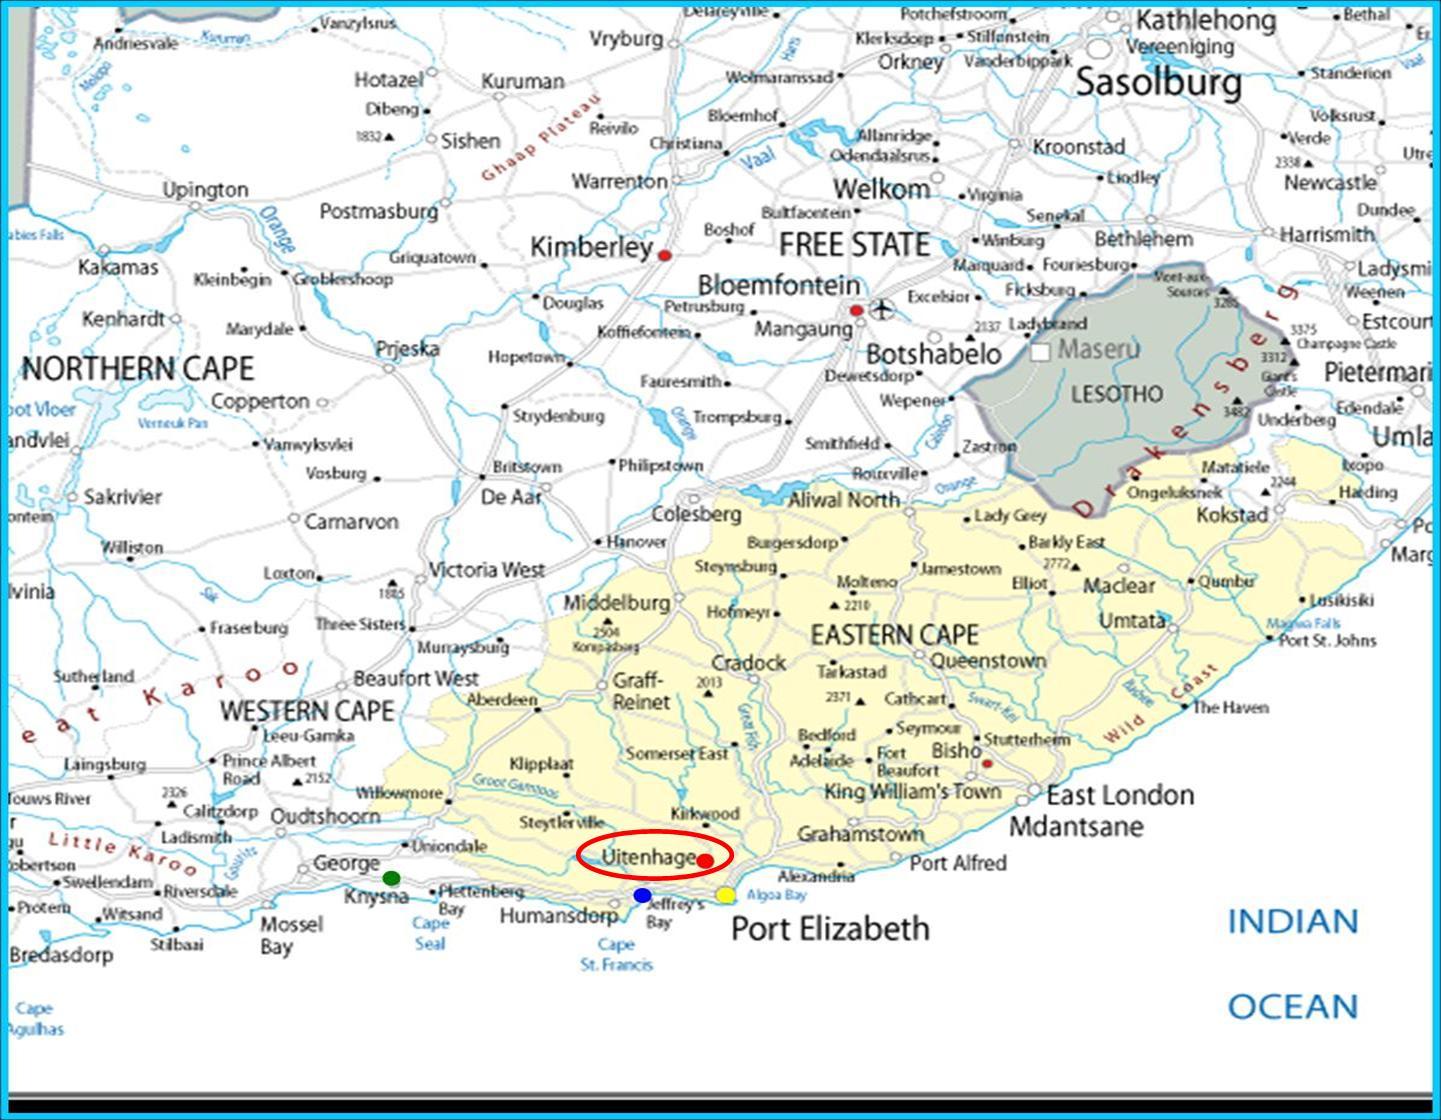 dating uitenhage south africa local